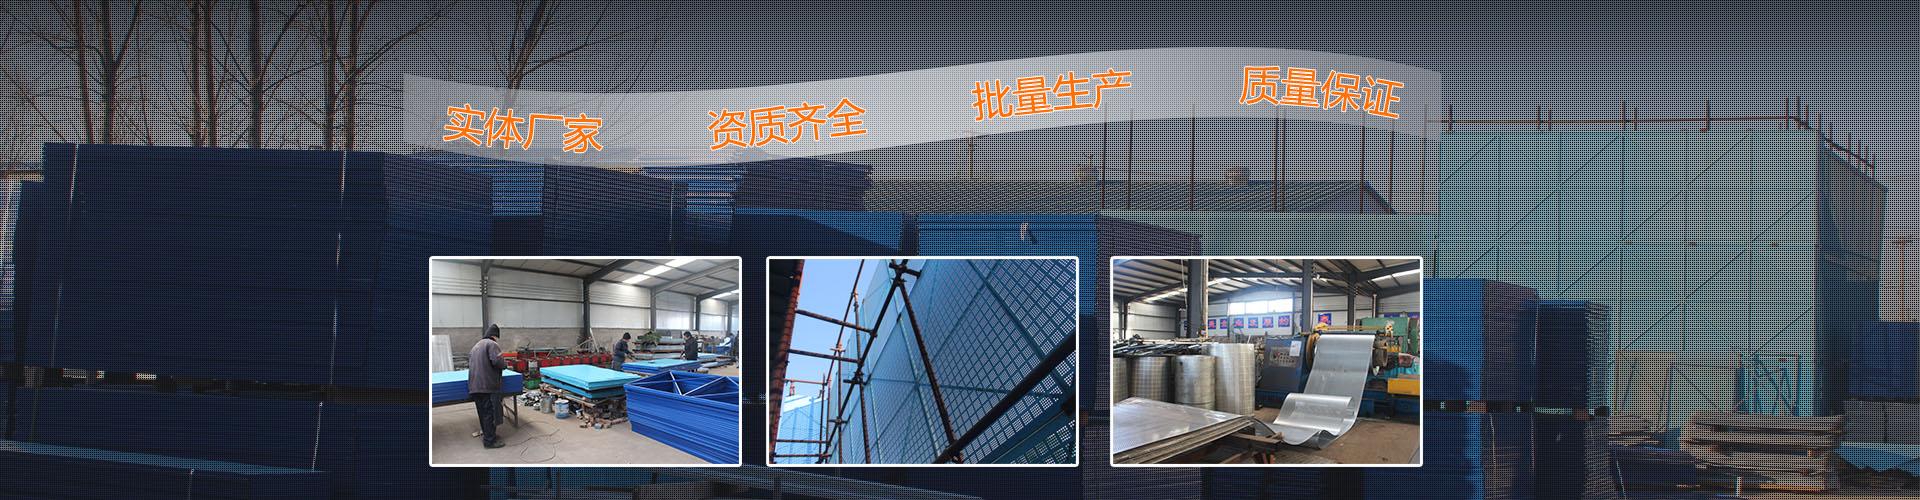 太阳集团网站guodashi.com